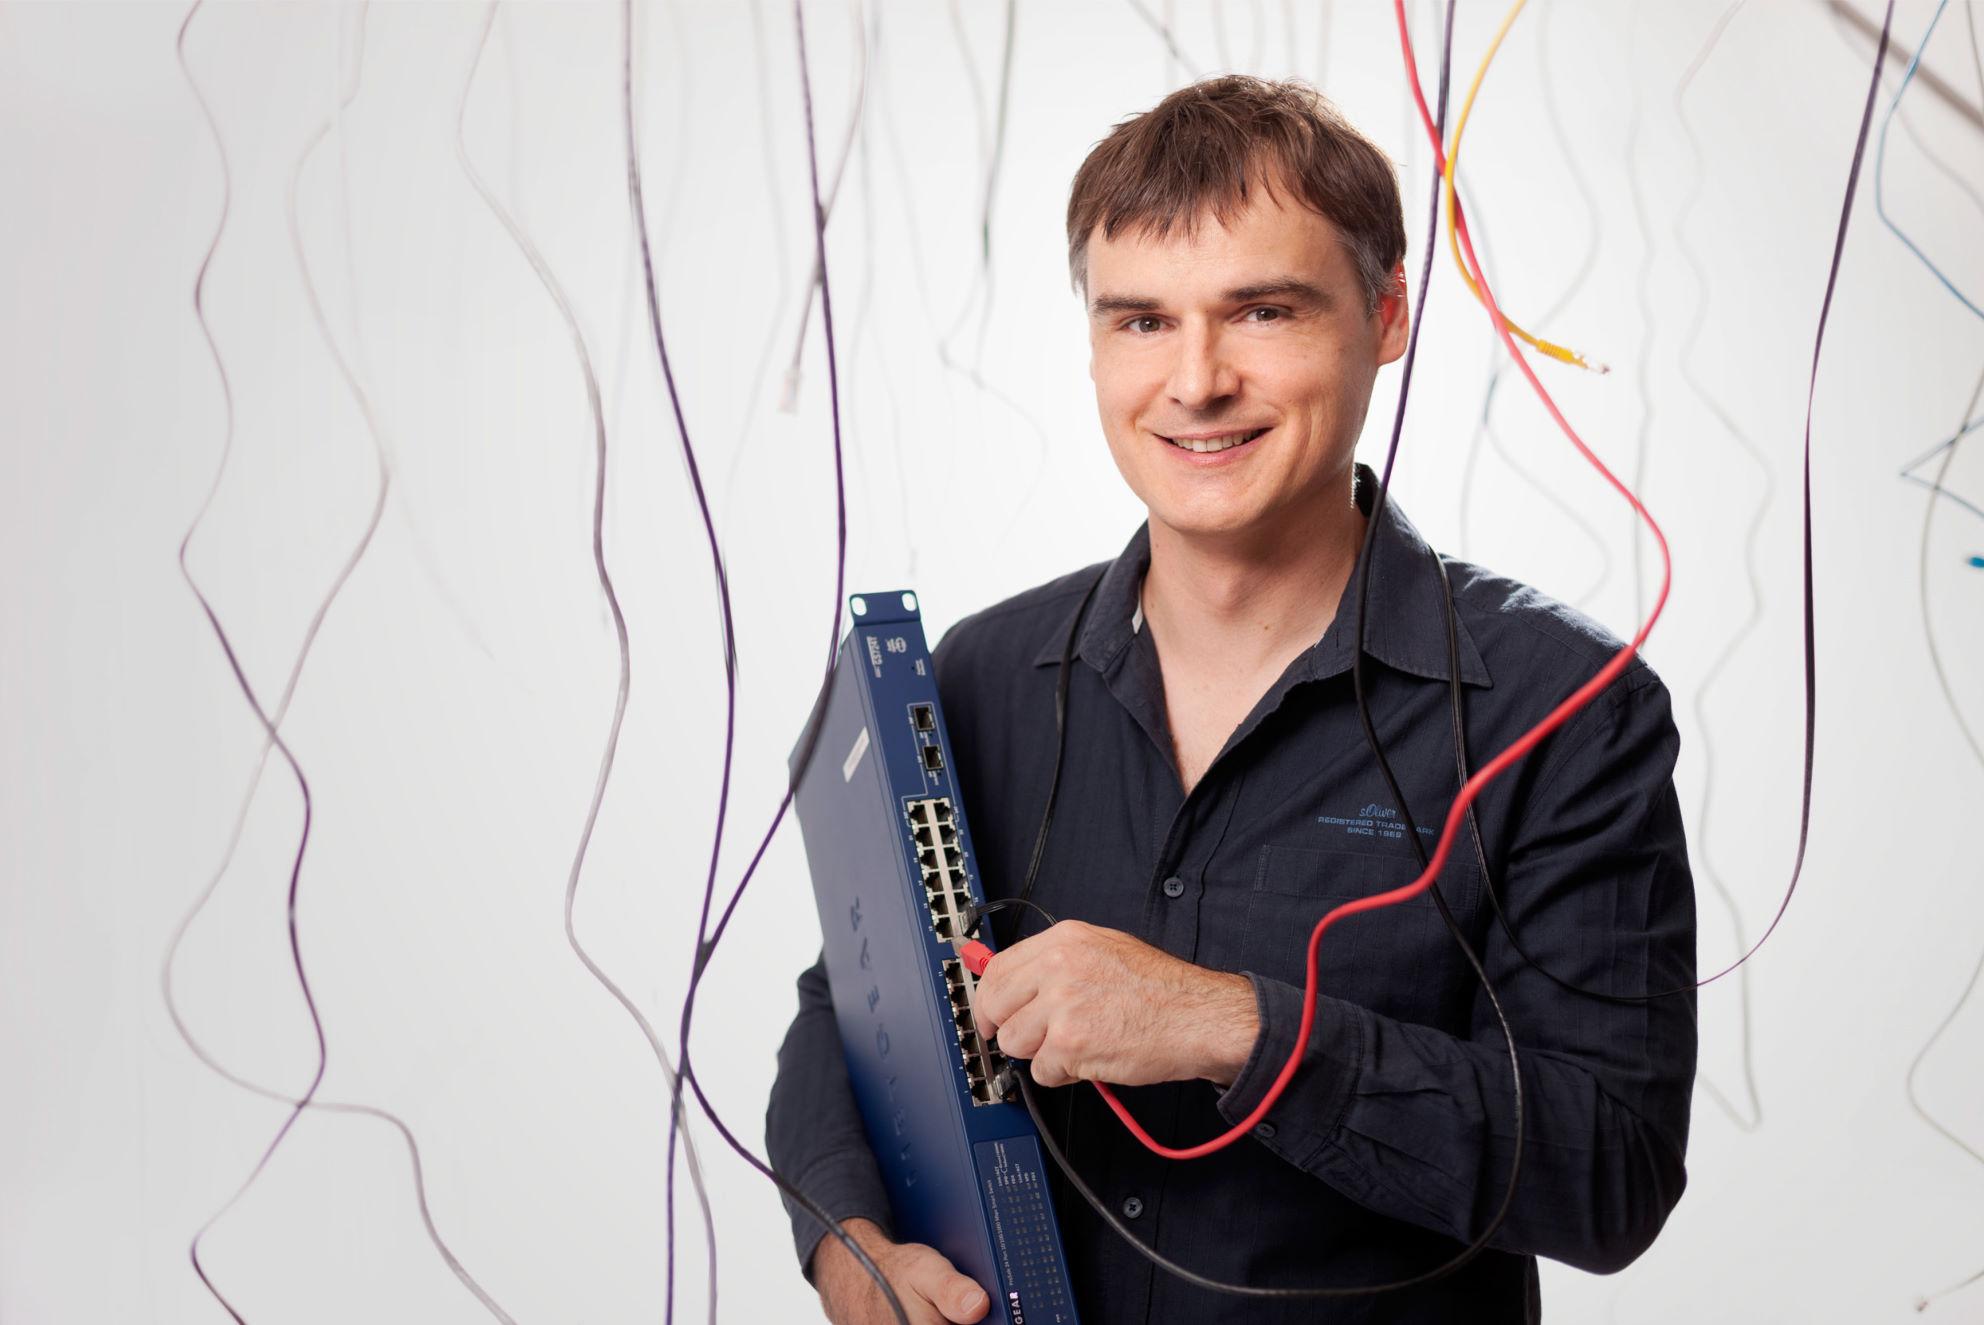 Peter Unterasinger, U-NET